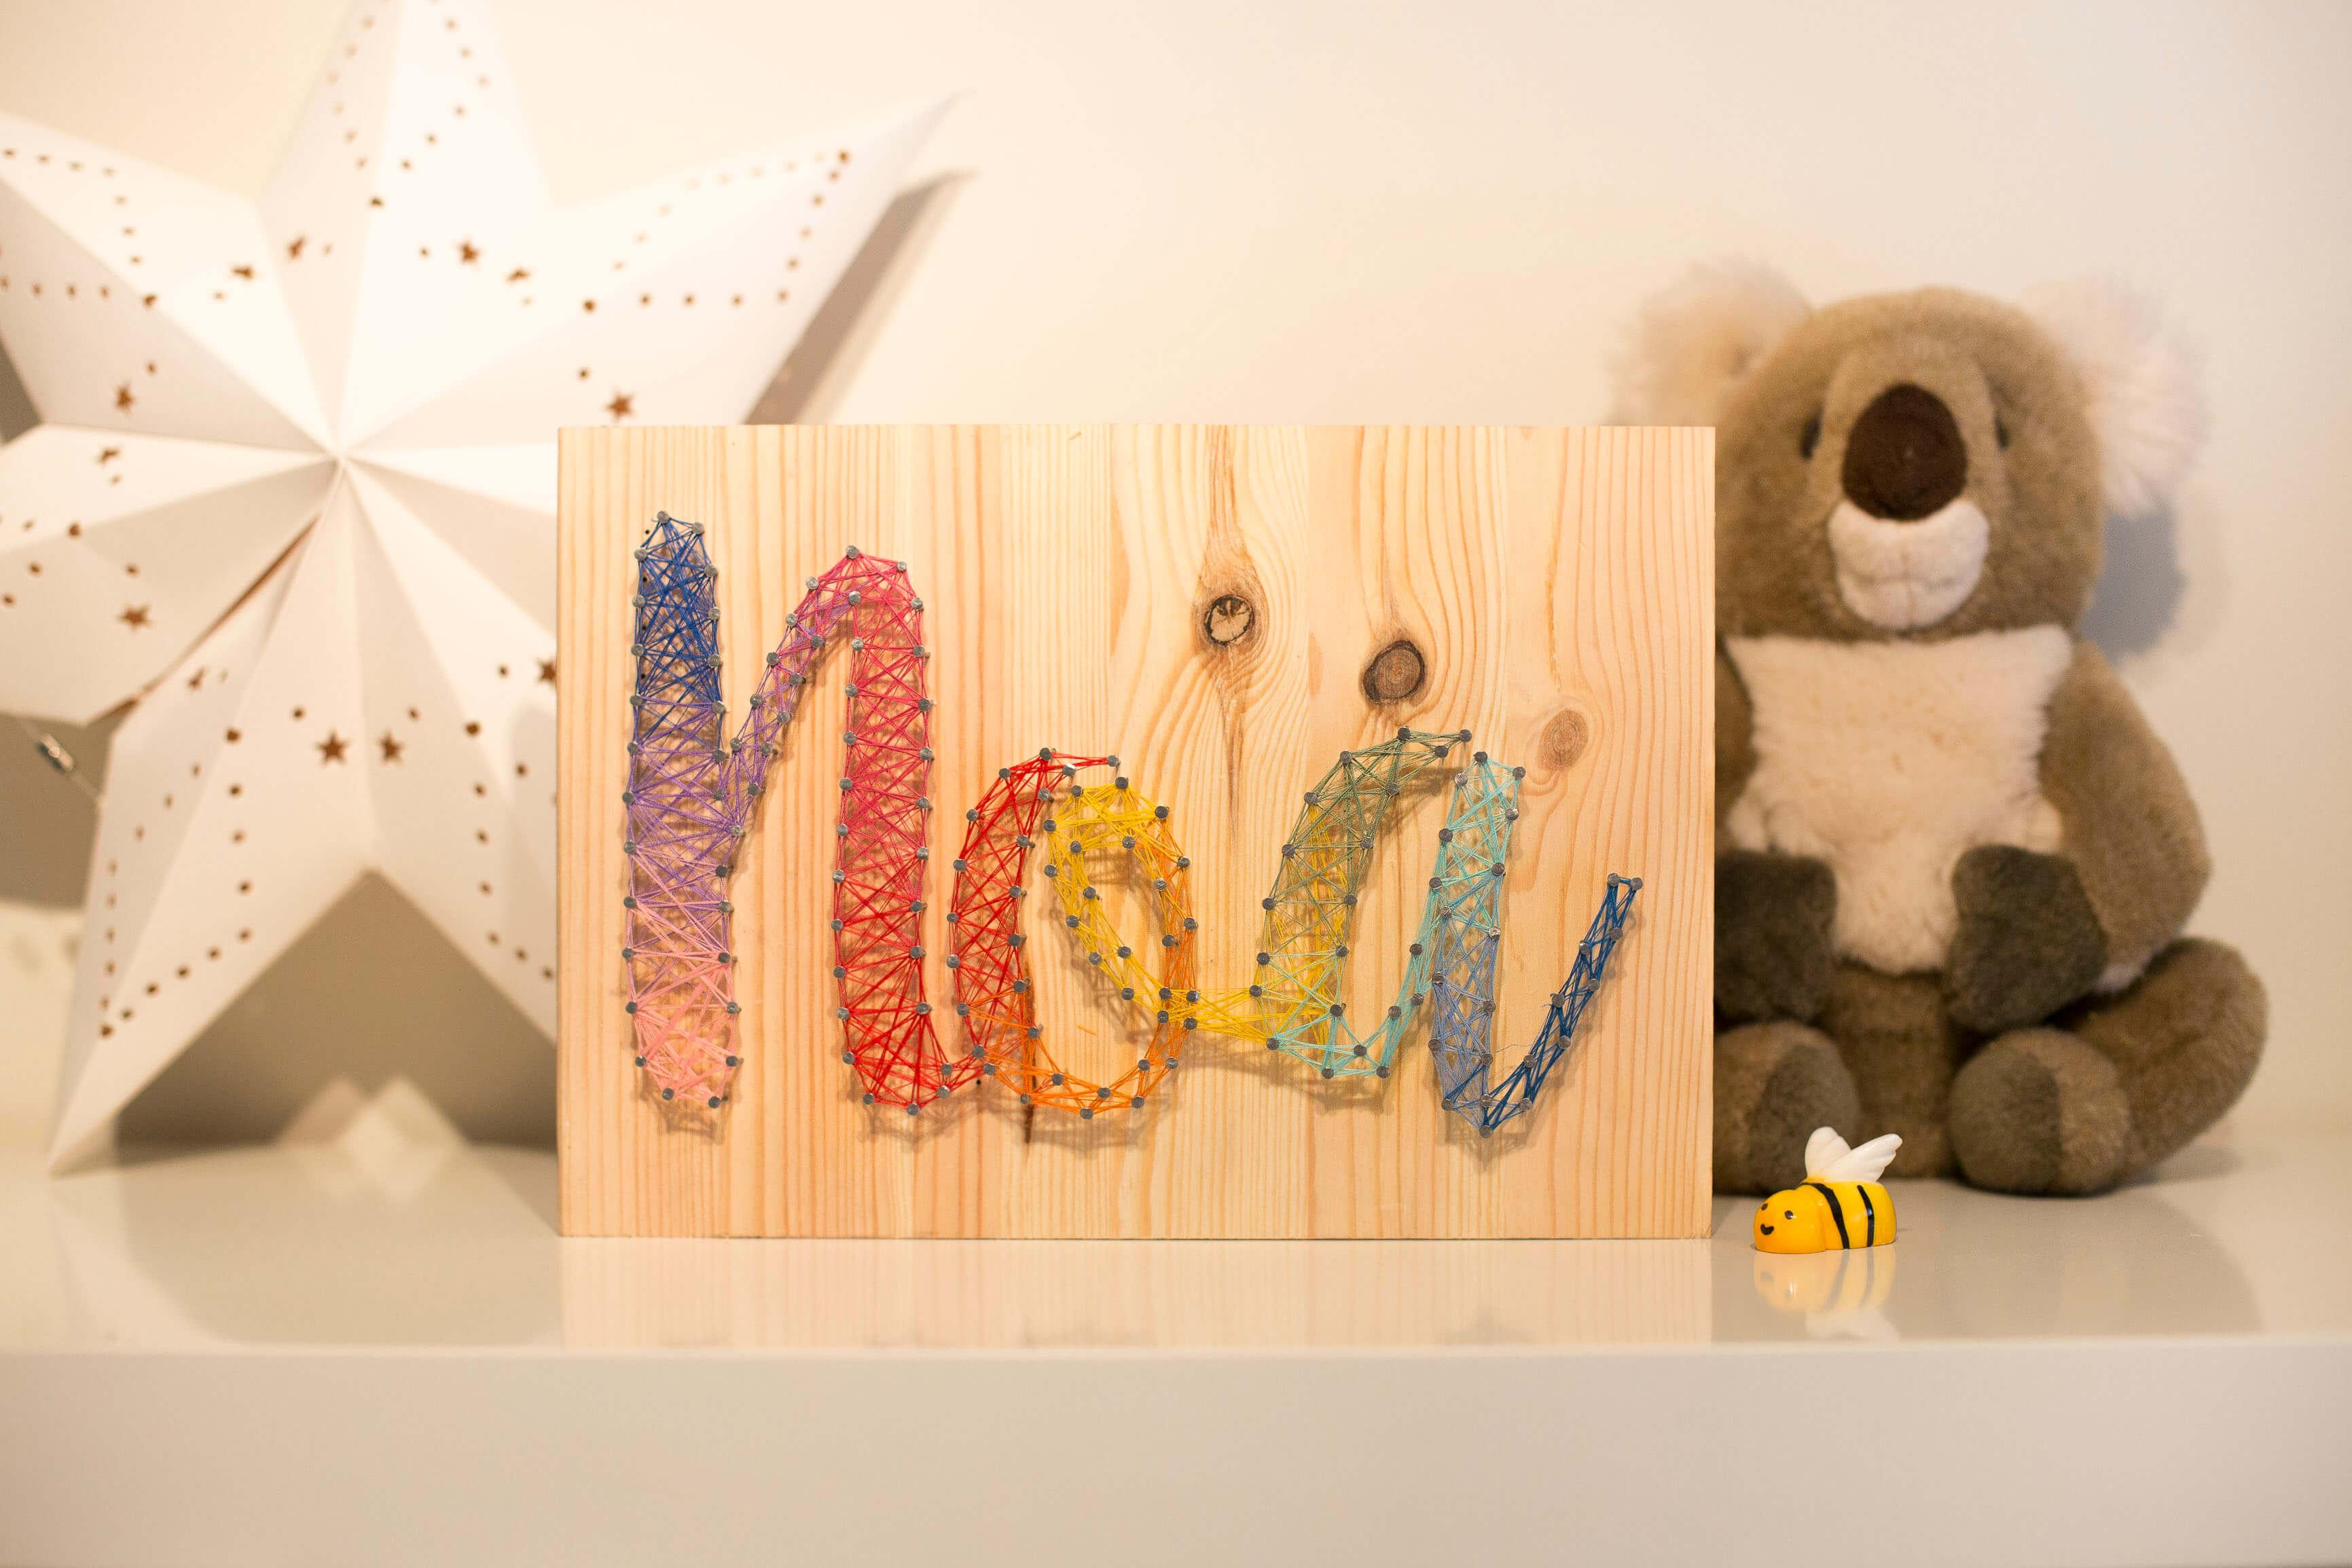 Manualidades fciles con madera 10 ideas Handfie DIy